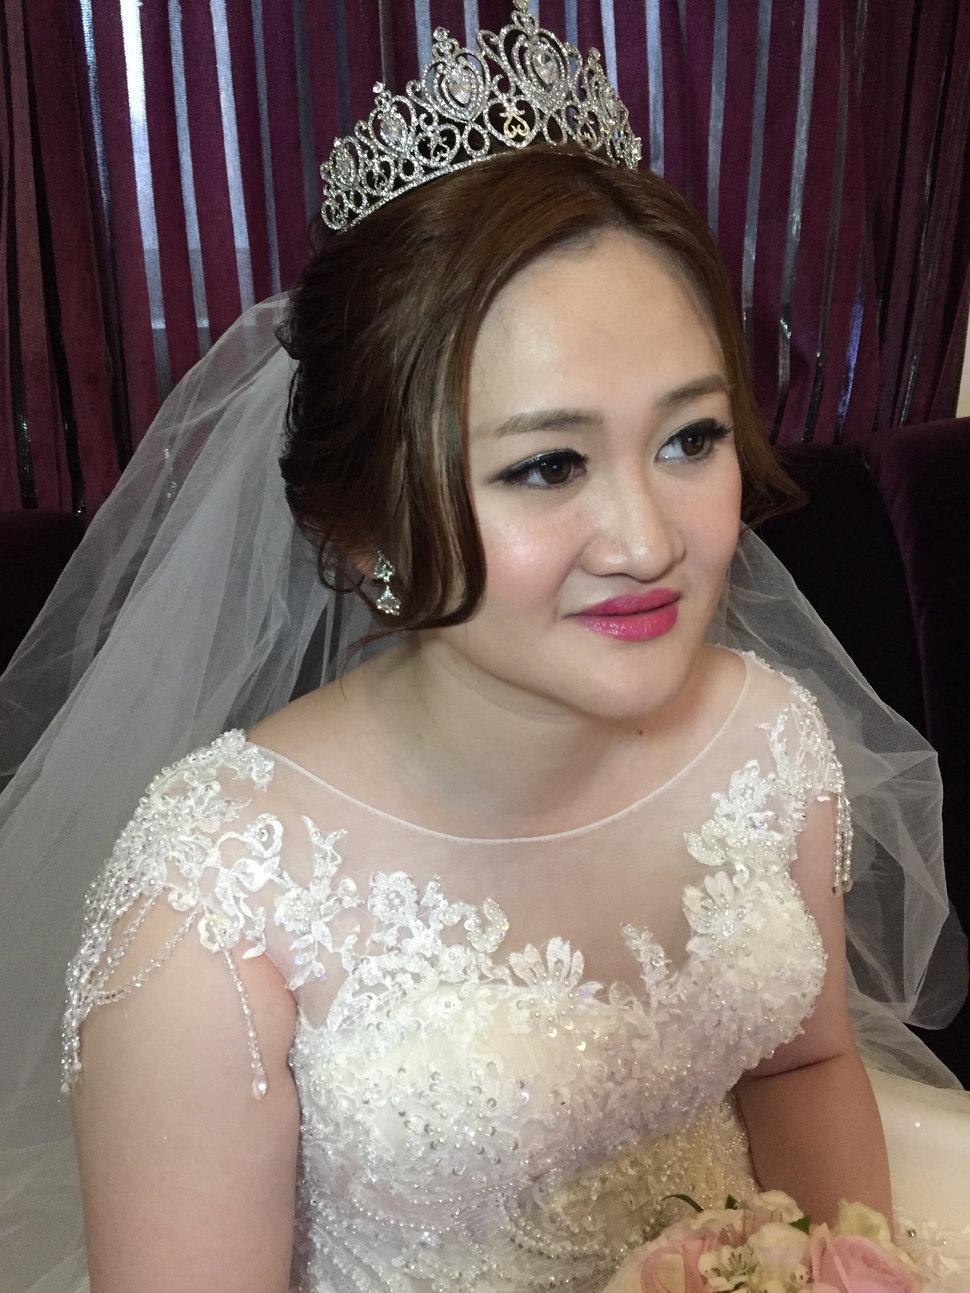 IMG_6273 - Jojo chen Makeup新娘秘書《結婚吧》